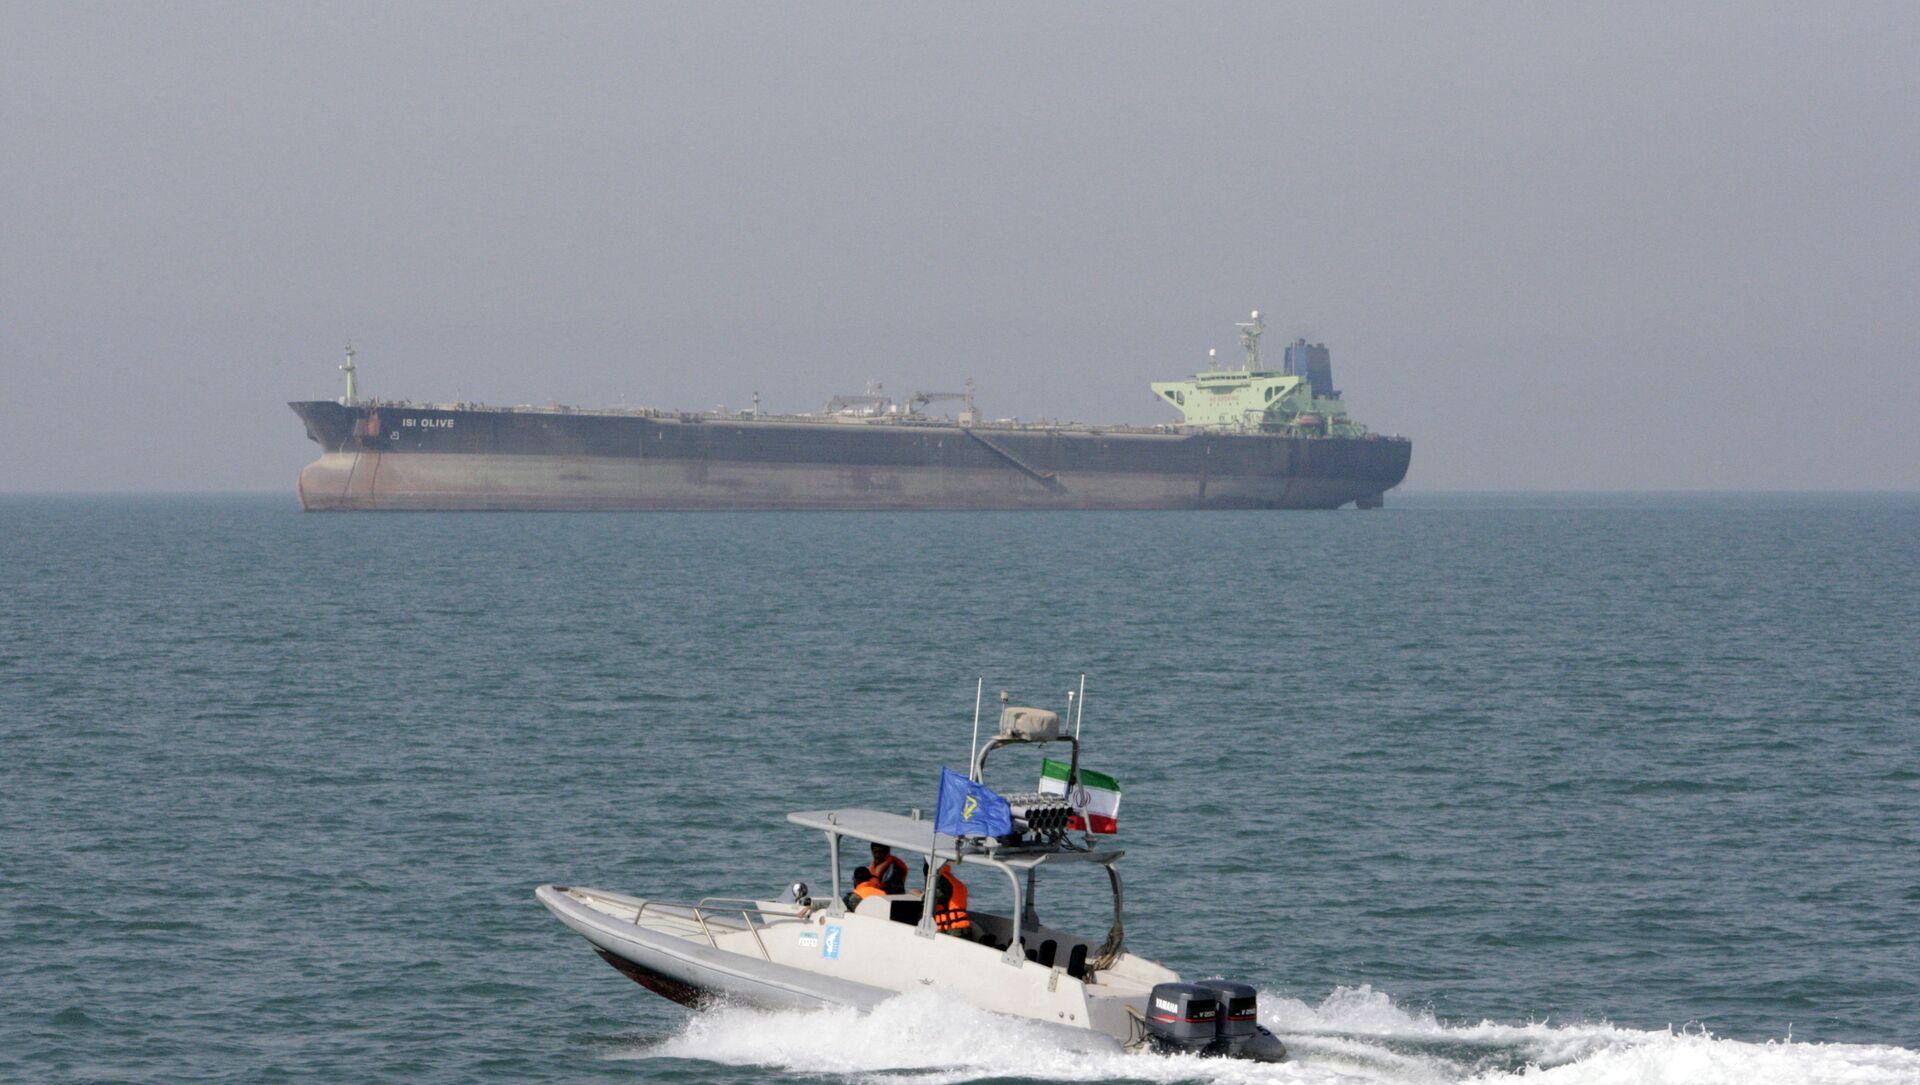 Iranian Revolutionary Guard speedboat moves in the Persian Gulf near an oil tanker (File) - Sputnik International, 1920, 04.08.2021